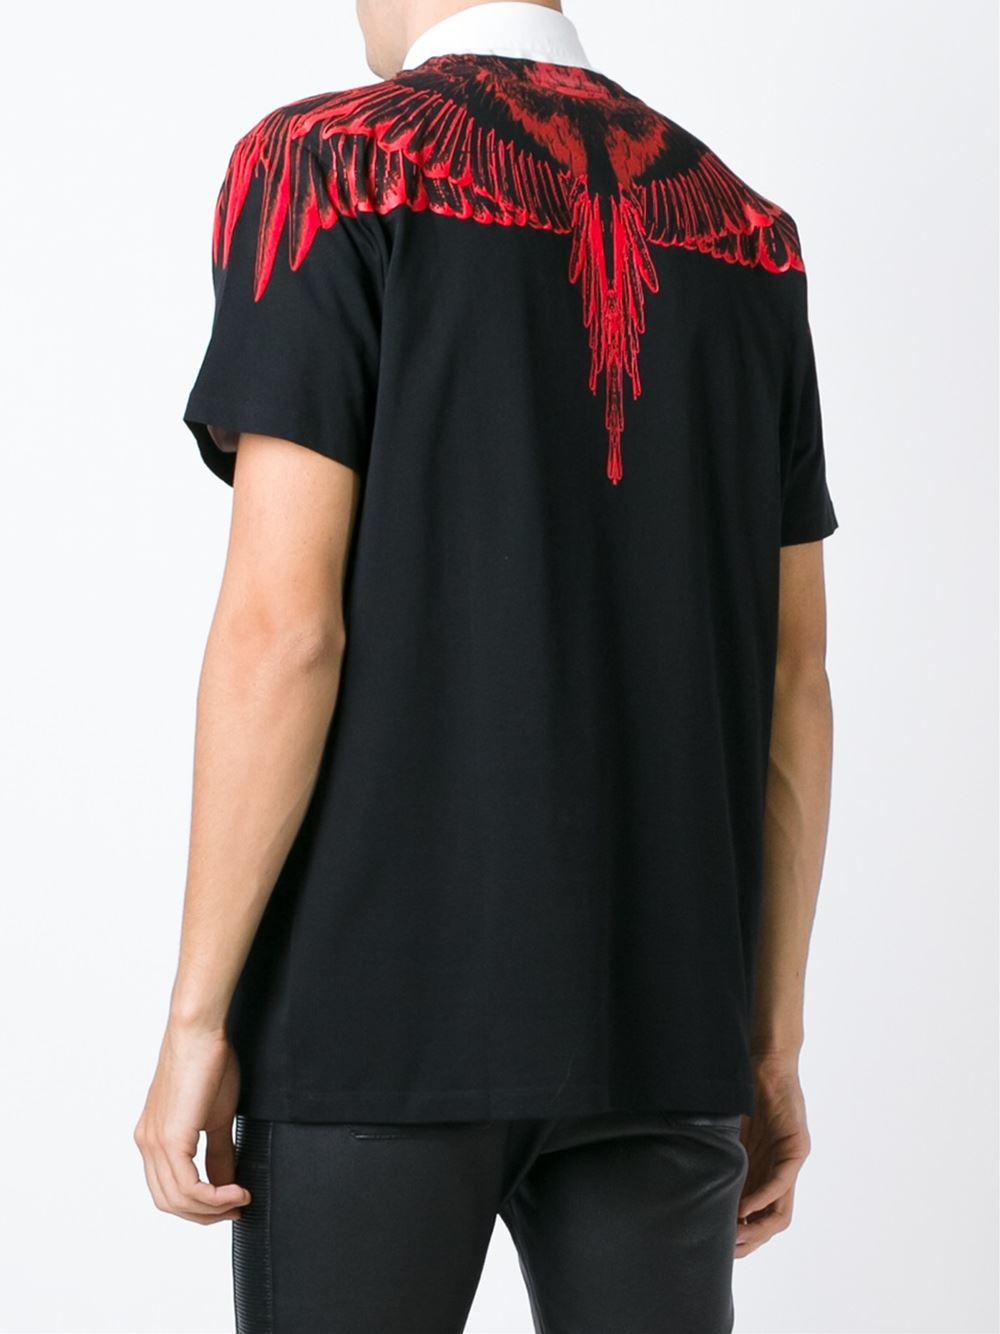 Wing Design Shirts